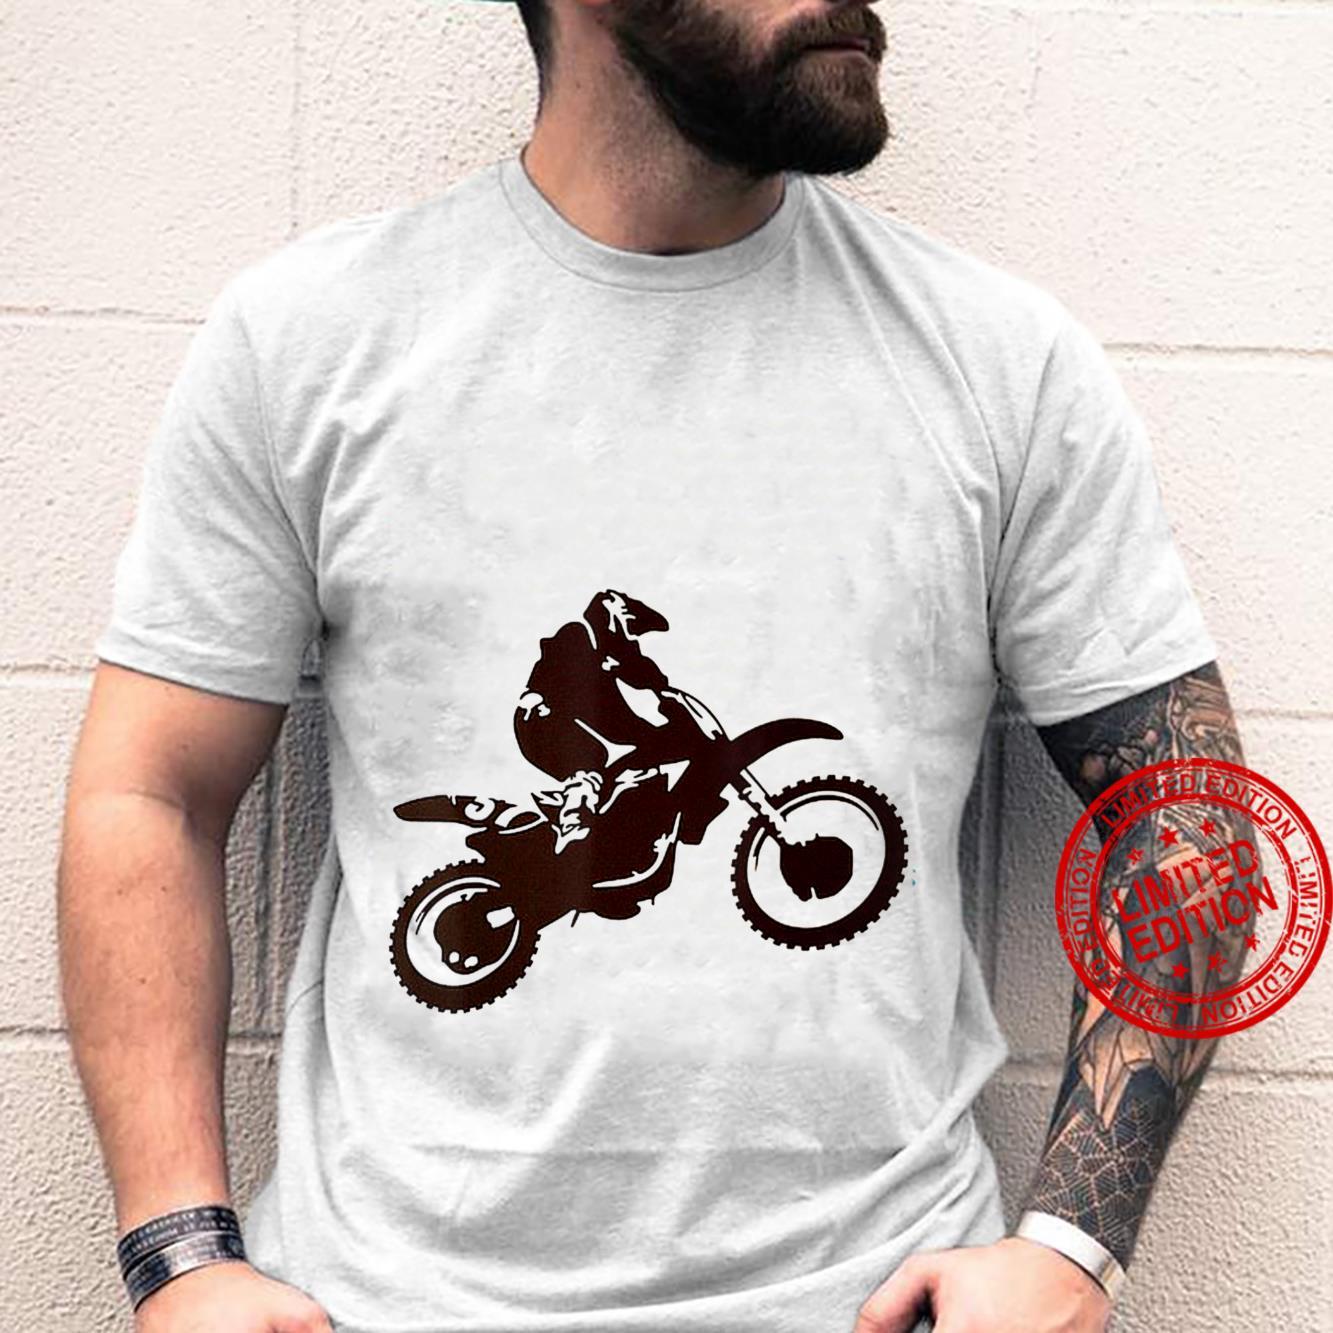 MotorX Silhouette Dirt Bike Shirt